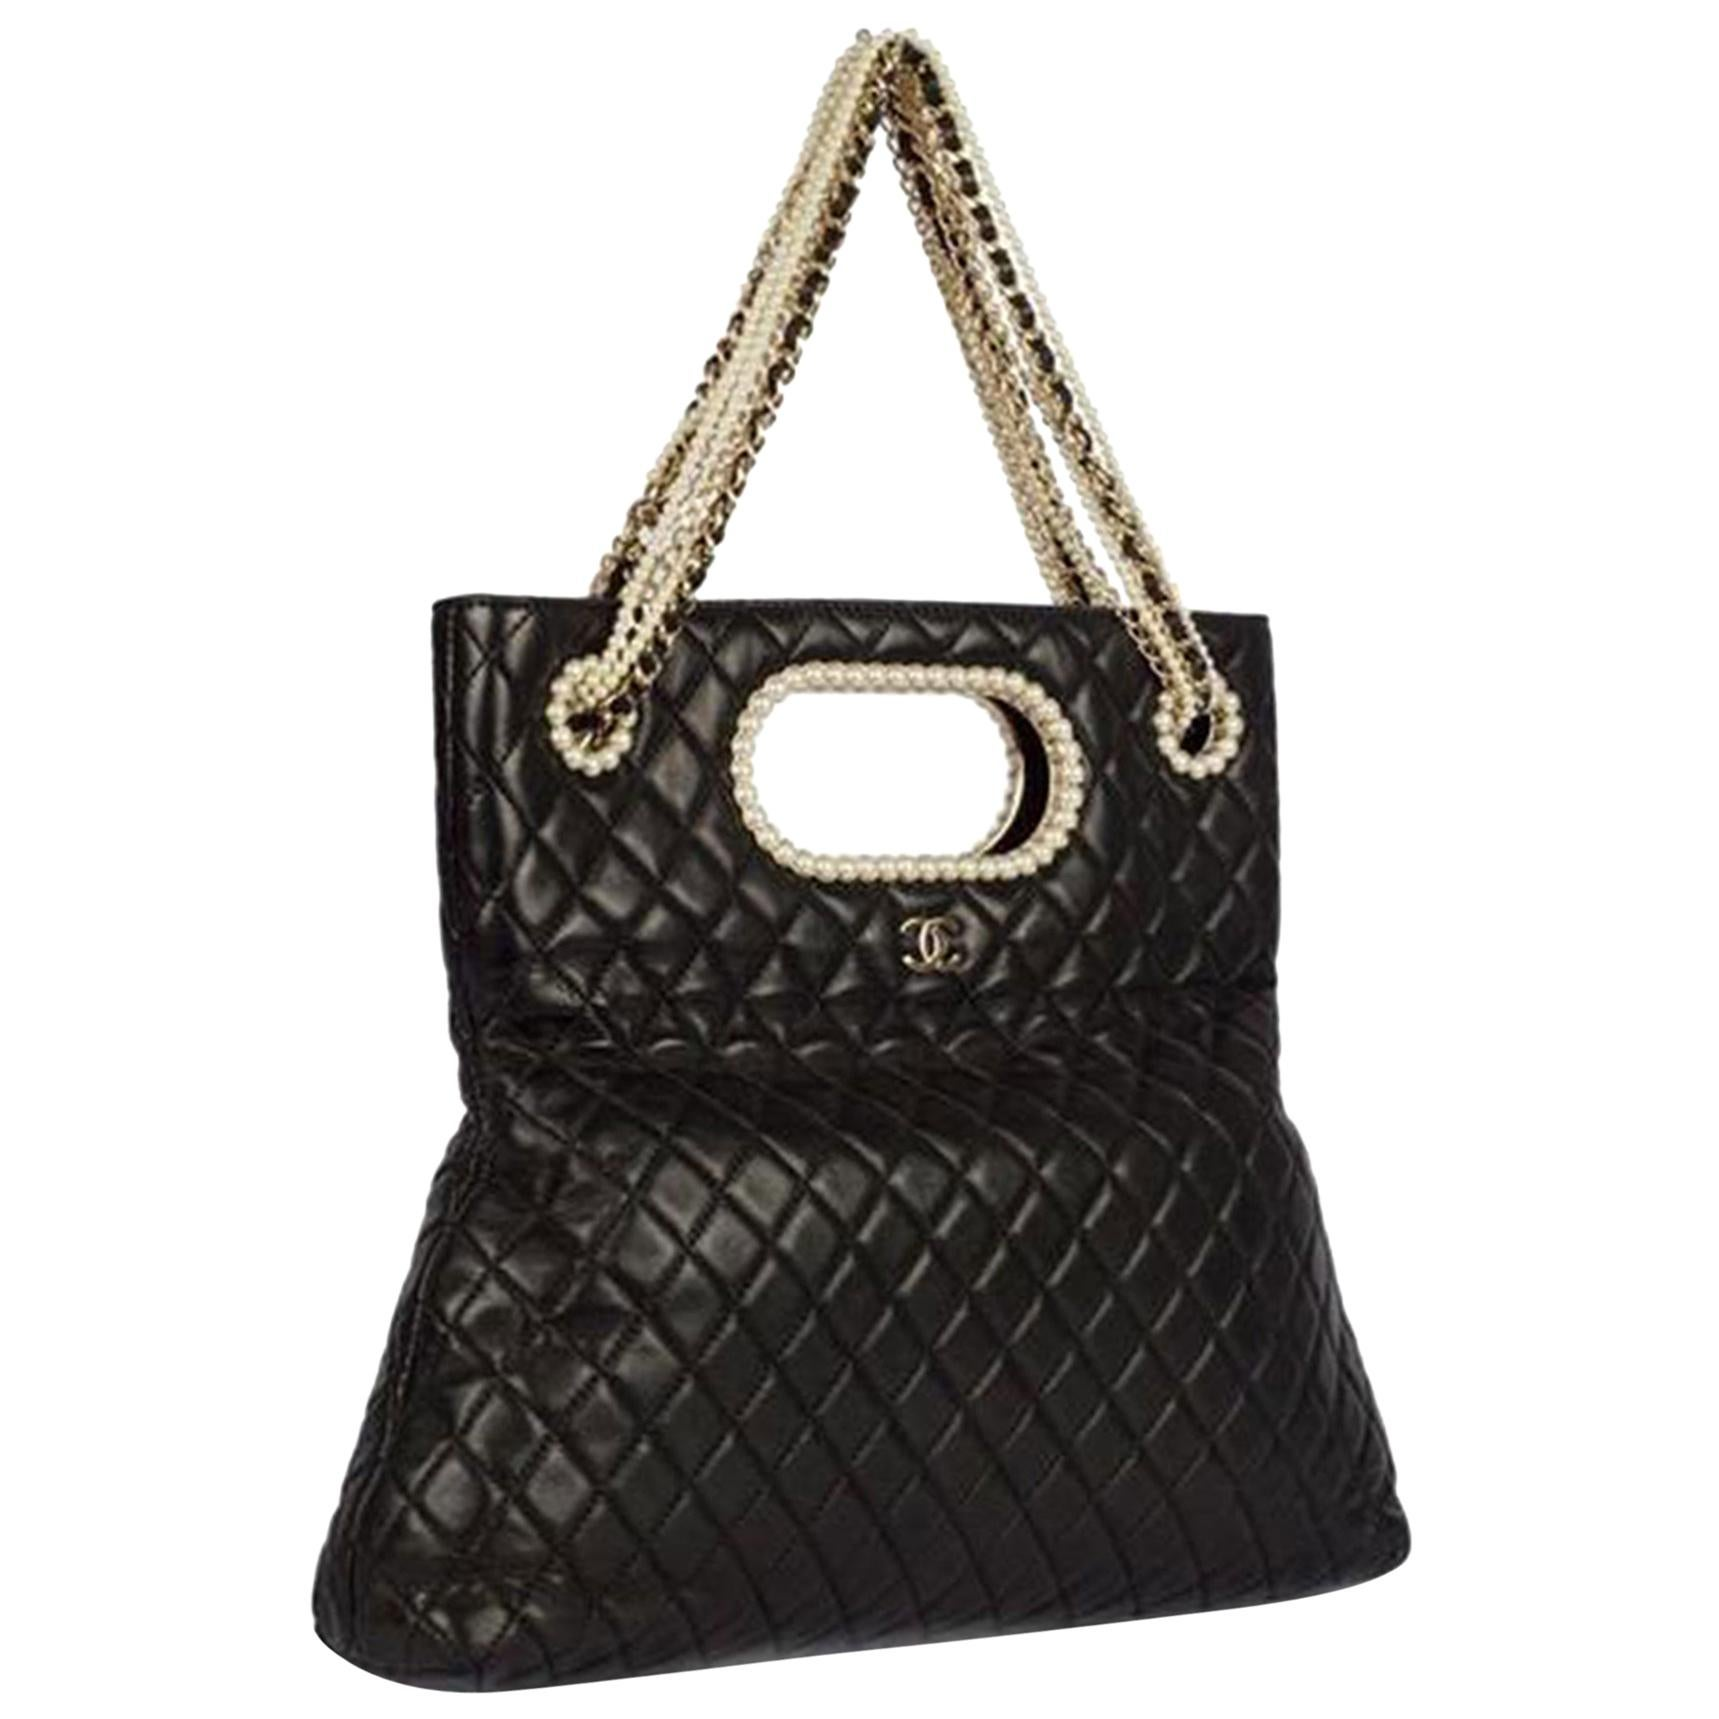 Chanel Timeless Rare Pearl Black Lambskin Shoulder Bag Tote & Minaudière Clutch